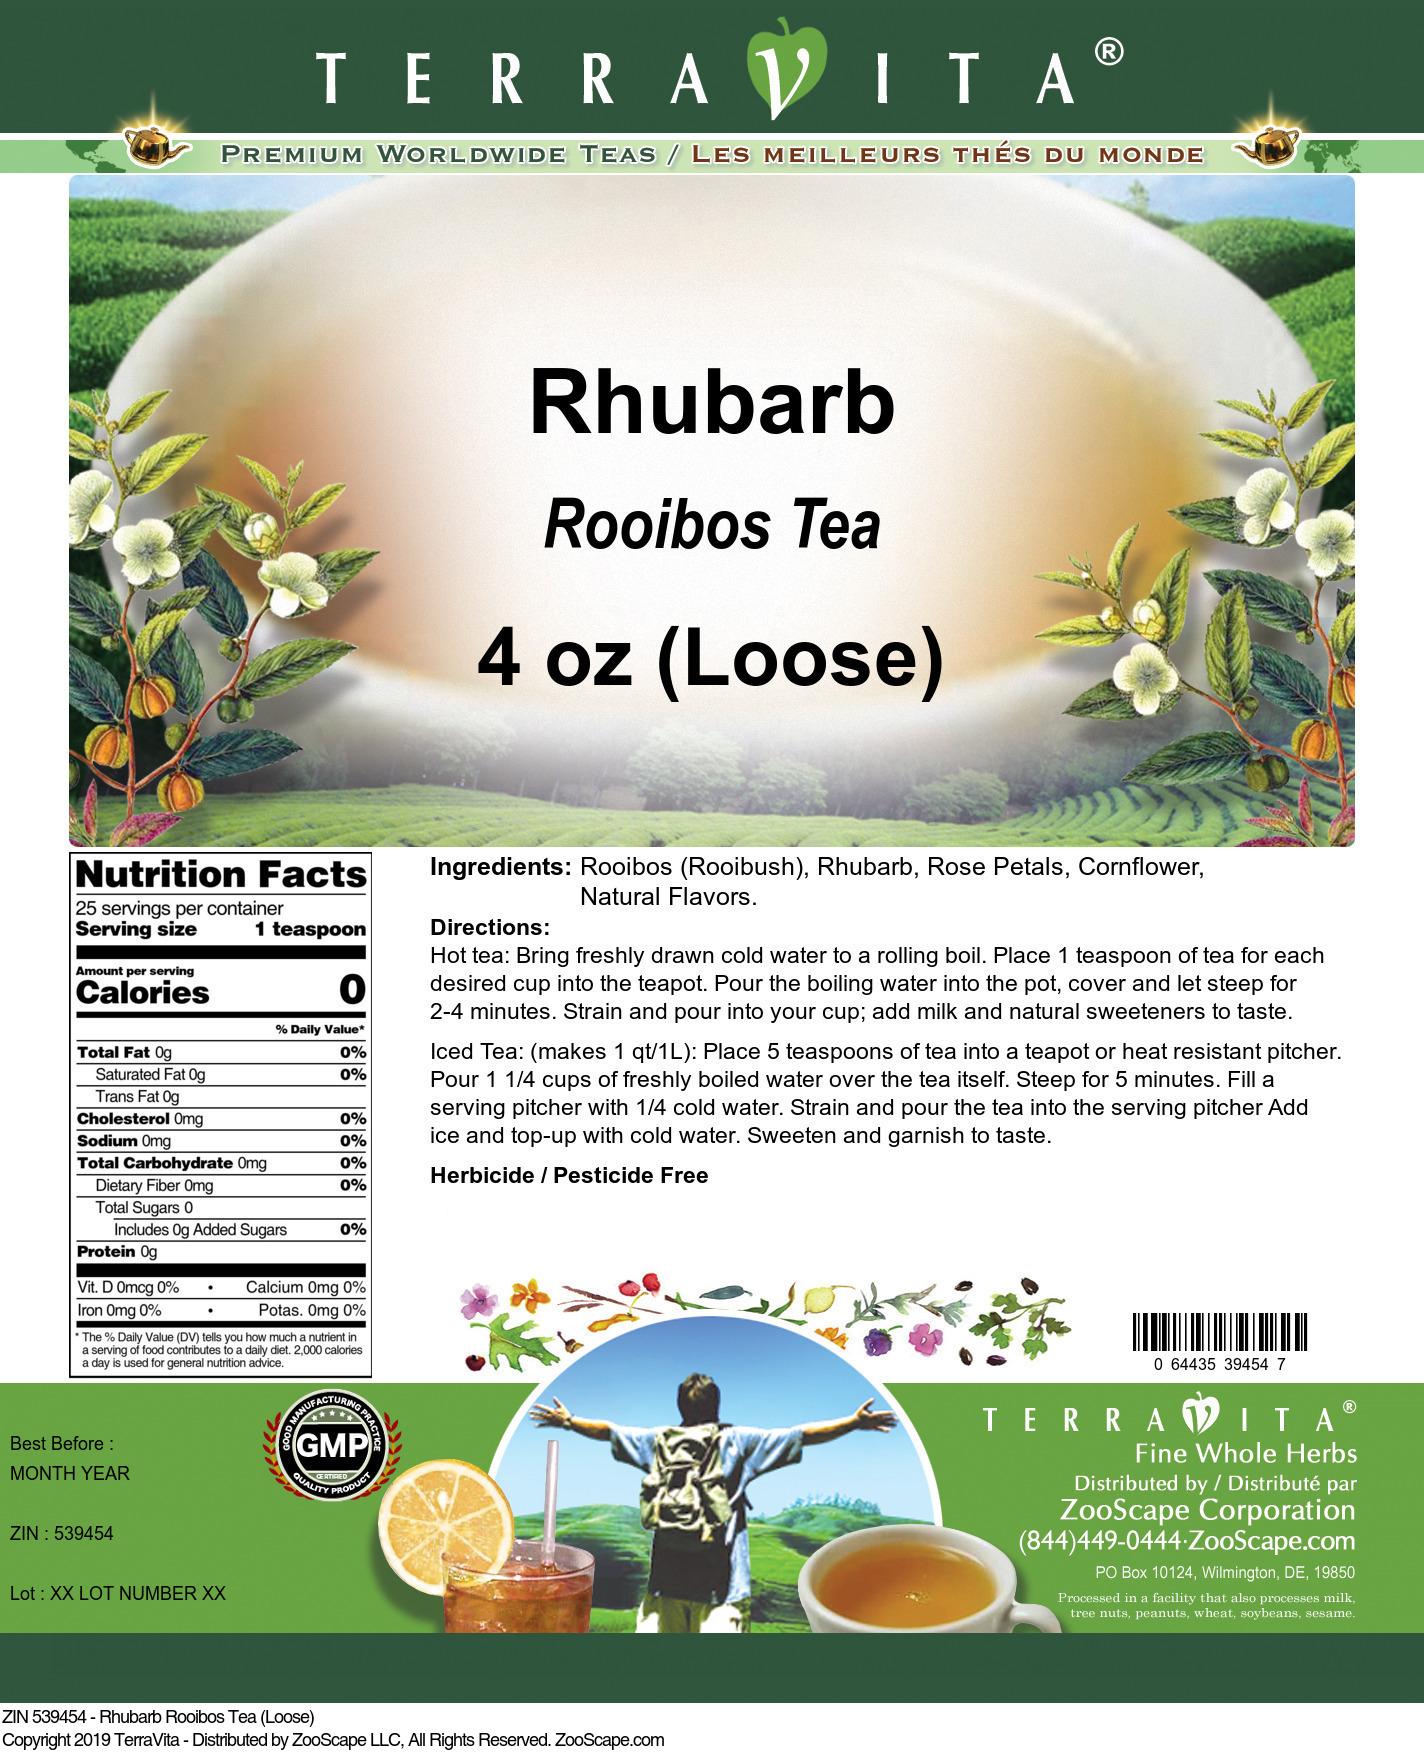 Rhubarb Rooibos Tea (Loose)